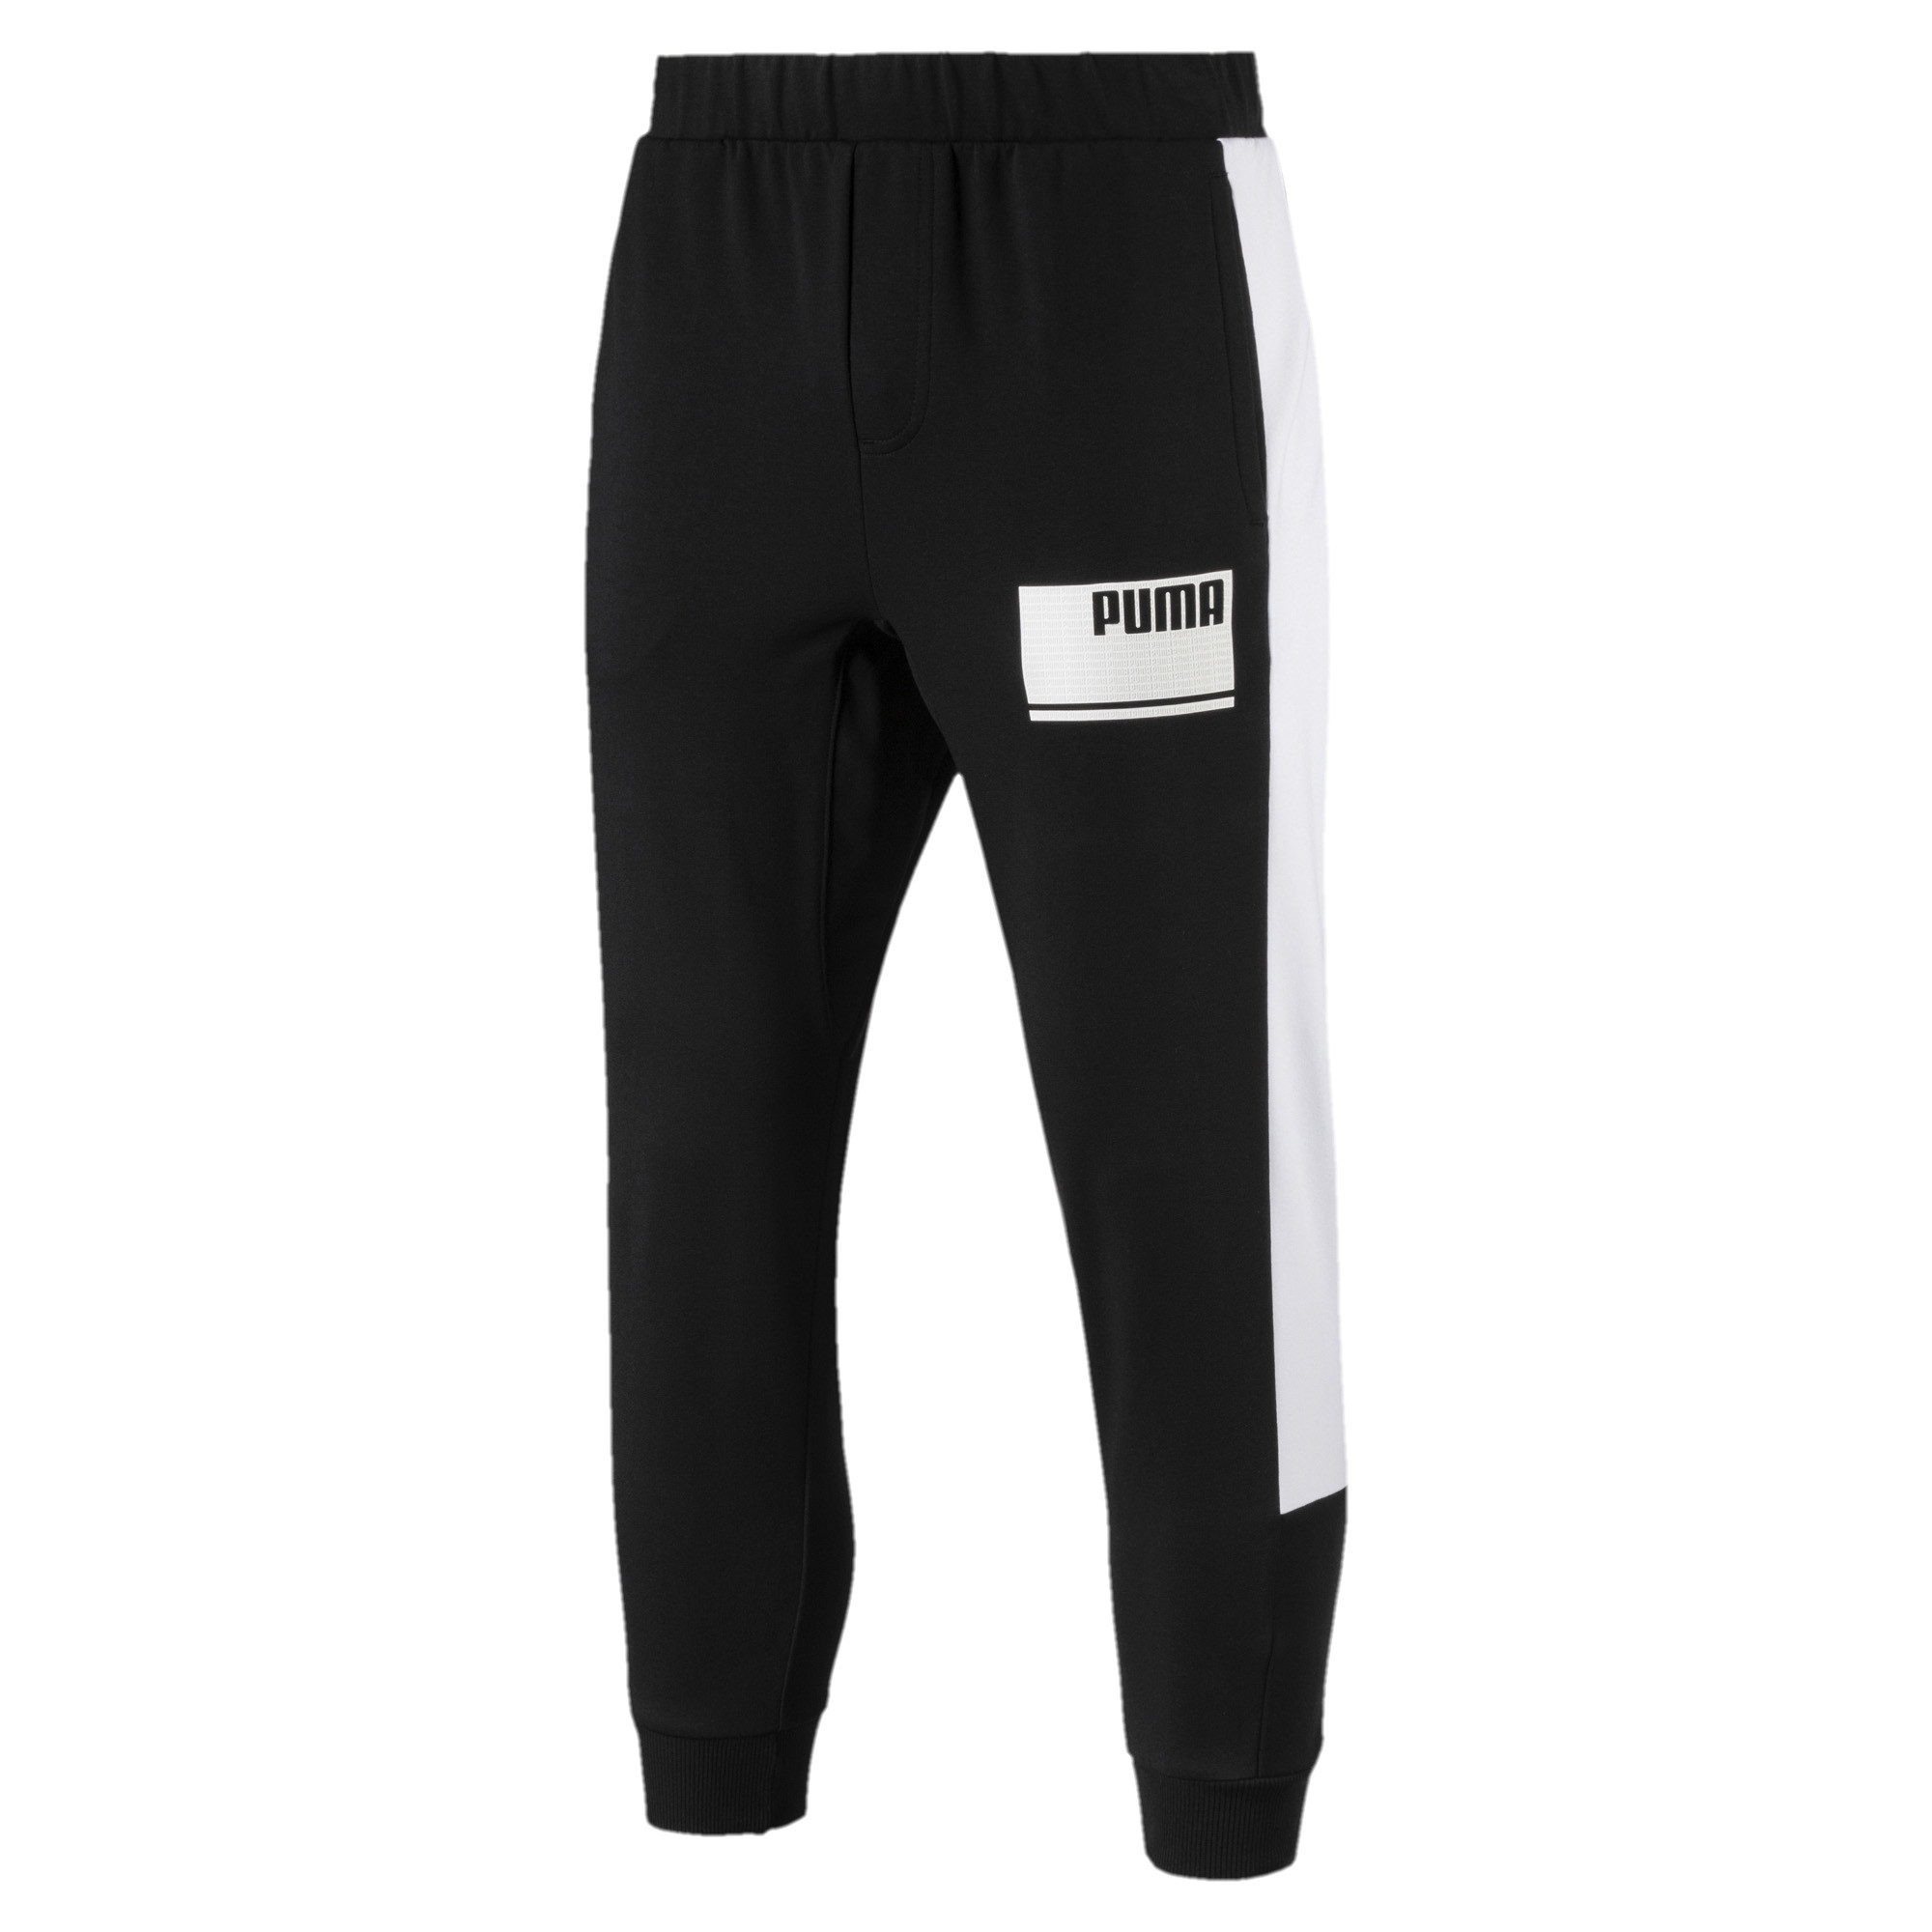 Image Puma Men's Summer Rebel Lite 7/8 Pants #1